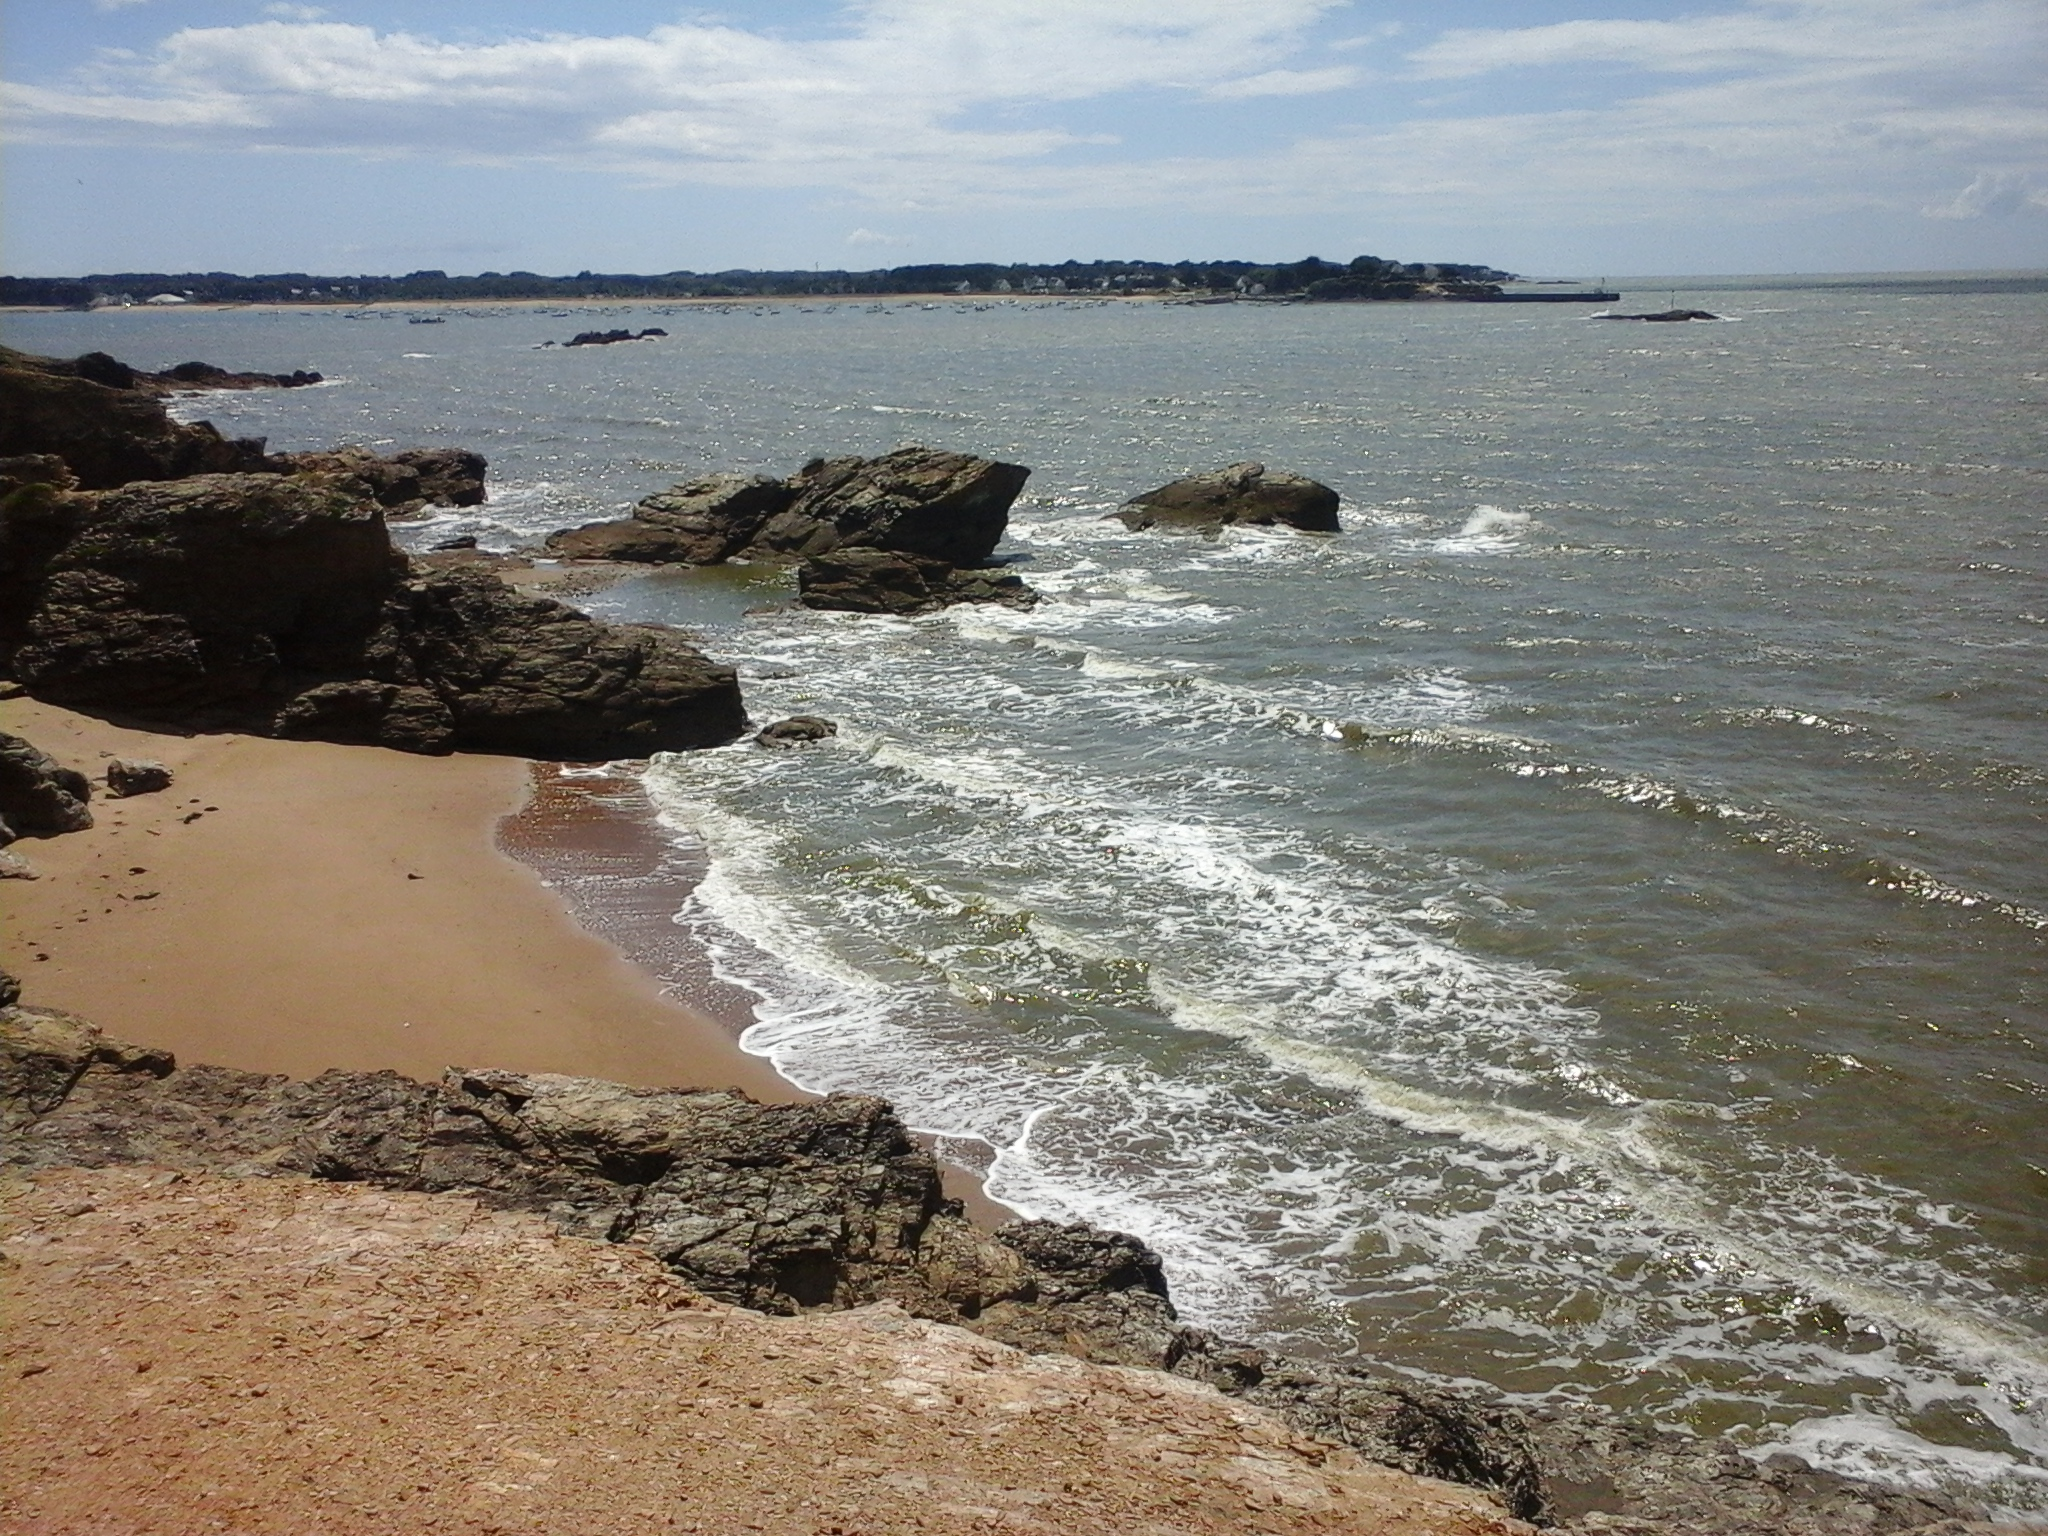 La mer, qu'on voit danser...